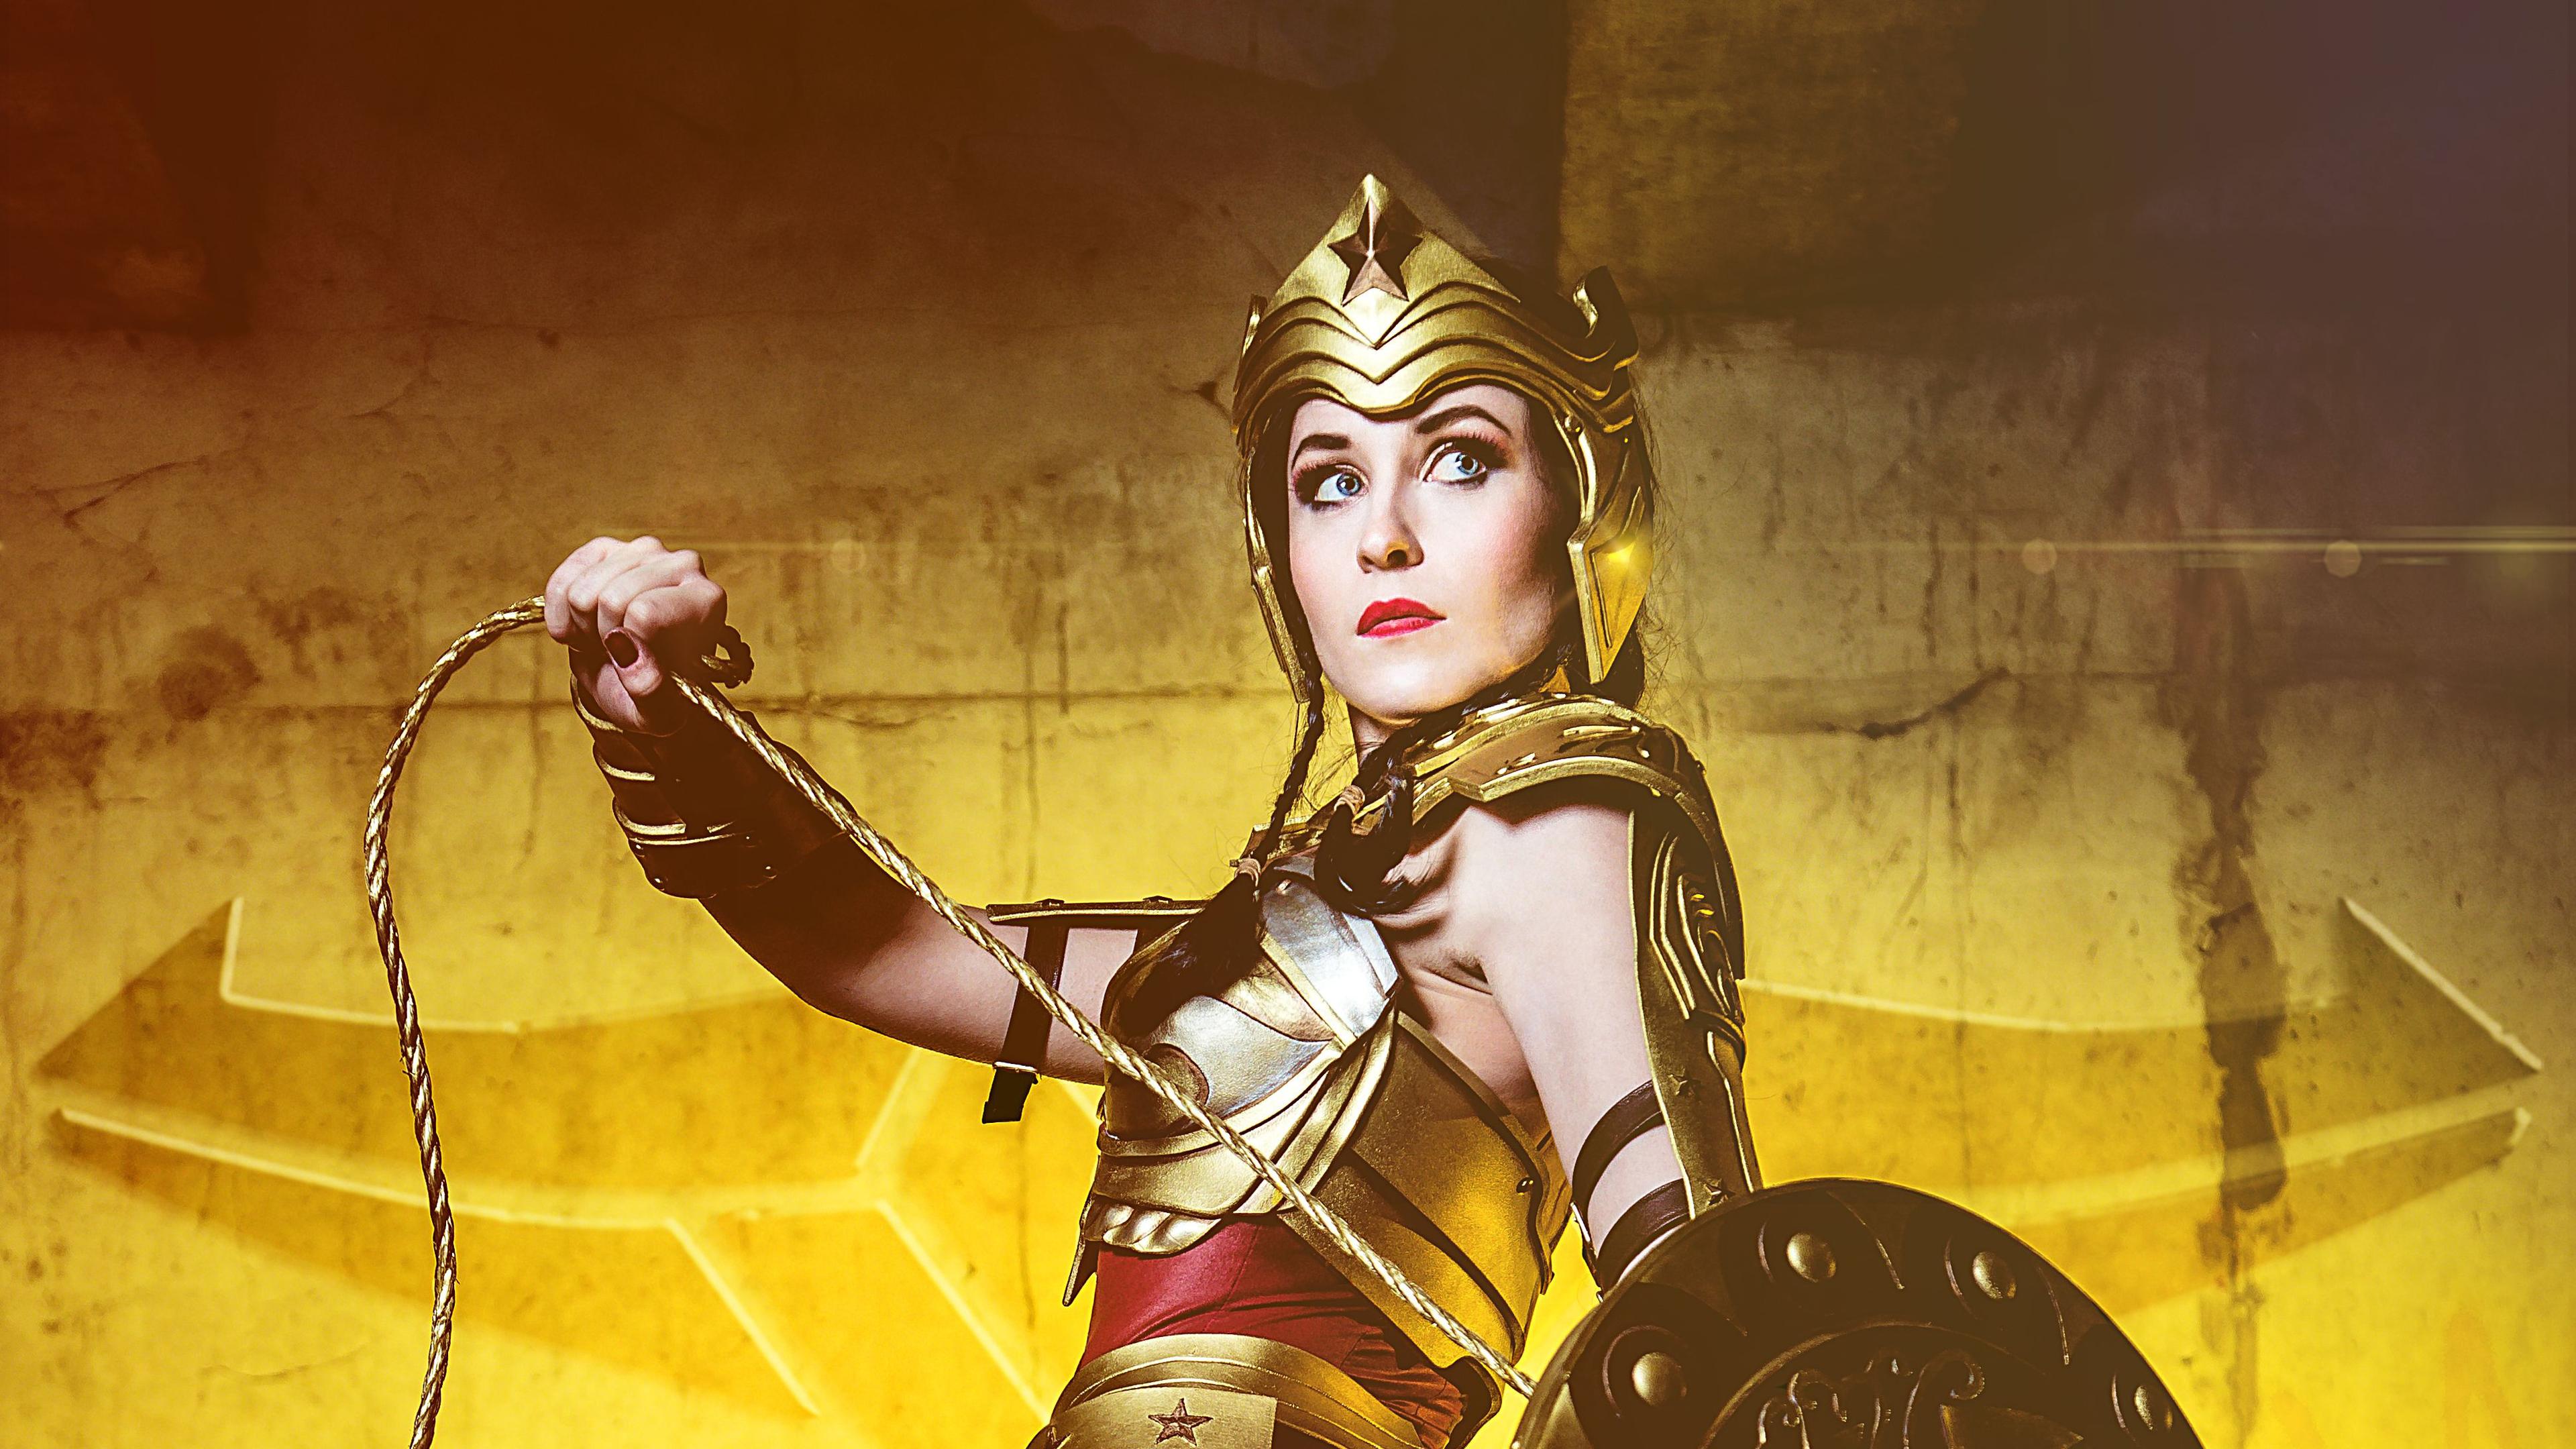 wonderwoman cosplay 4k 1555206630 - Wonderwoman Cosplay 4k - wonder woman wallpapers, superheroes wallpapers, hd-wallpapers, cosplay wallpapers, 4k-wallpapers